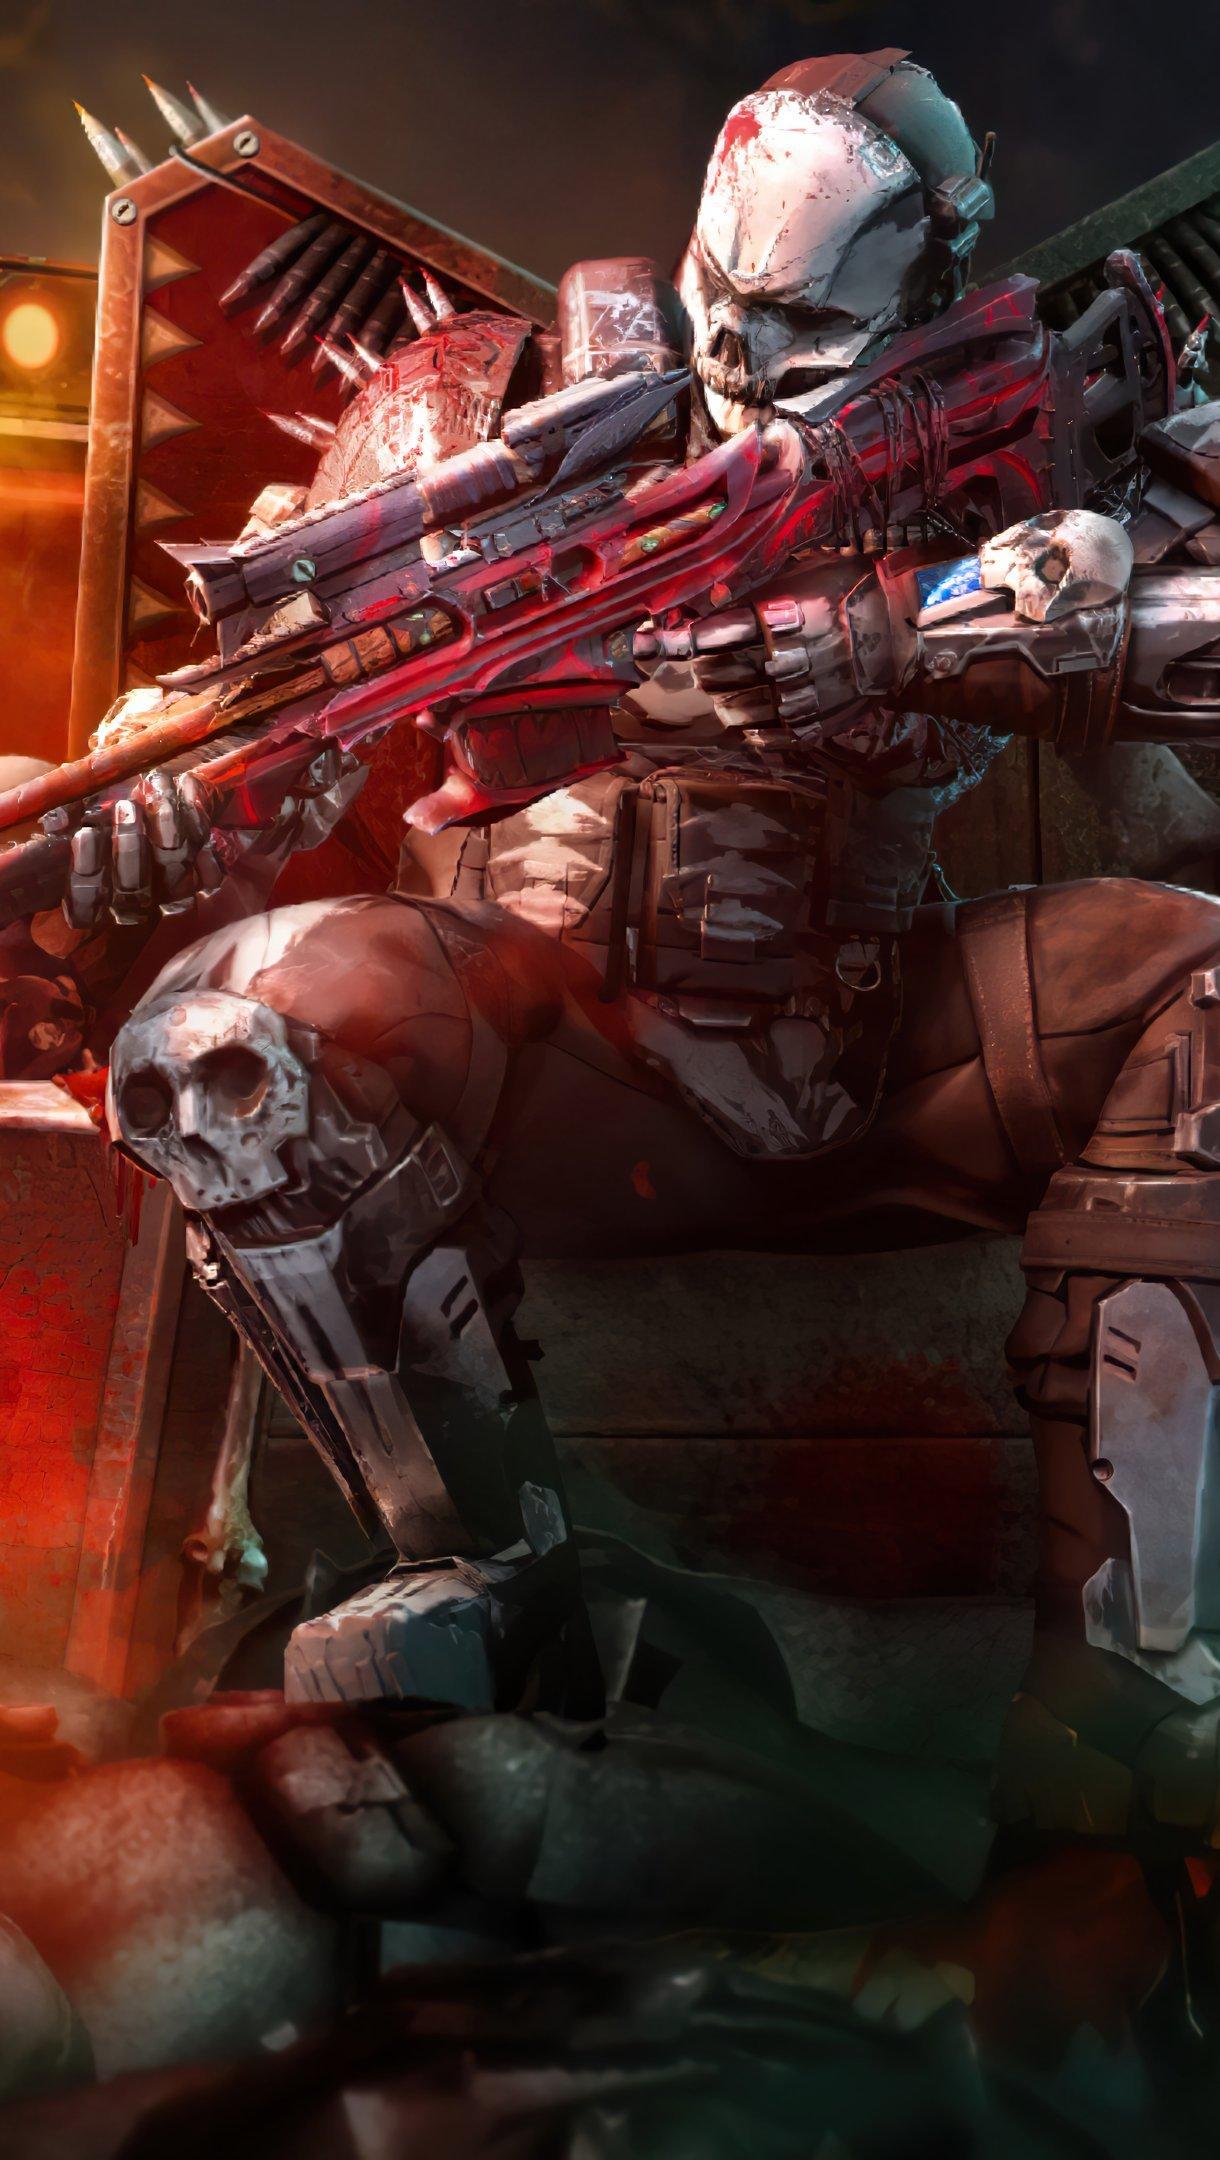 Fondos de pantalla Call of Duty Mobile rune bone warrior Vertical